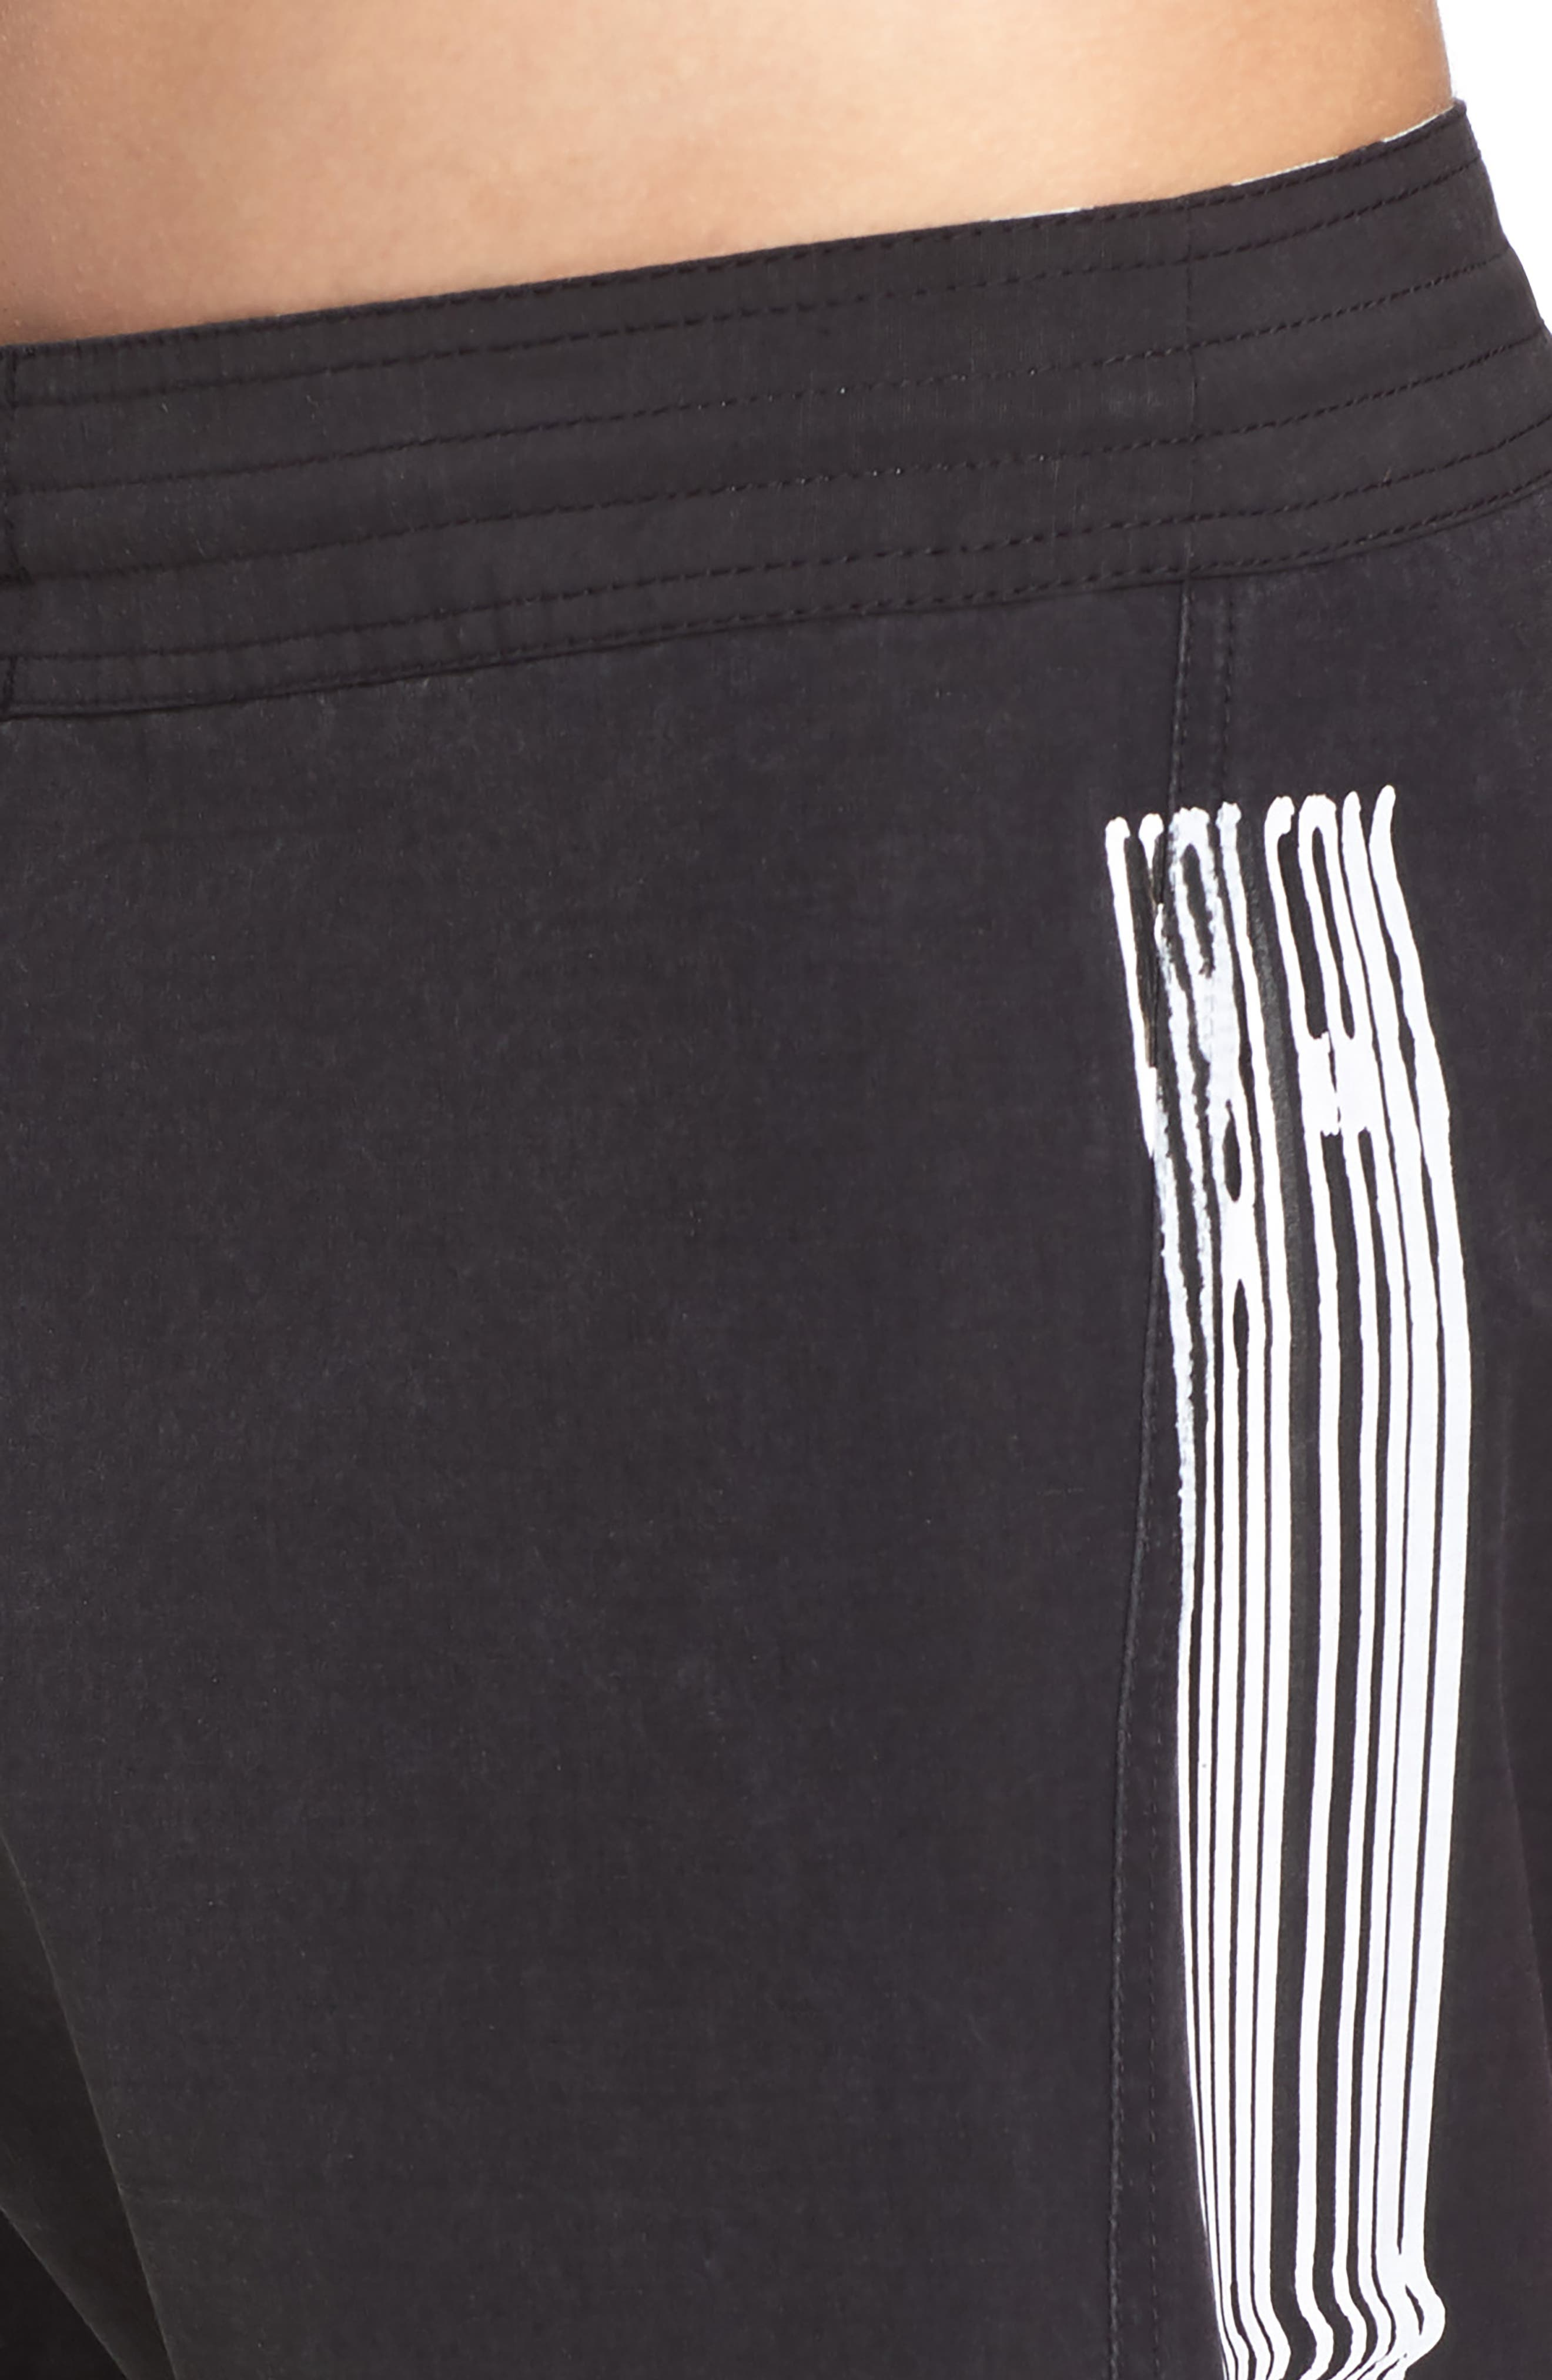 Side Fi Stoney Board Shorts,                             Alternate thumbnail 4, color,                             001